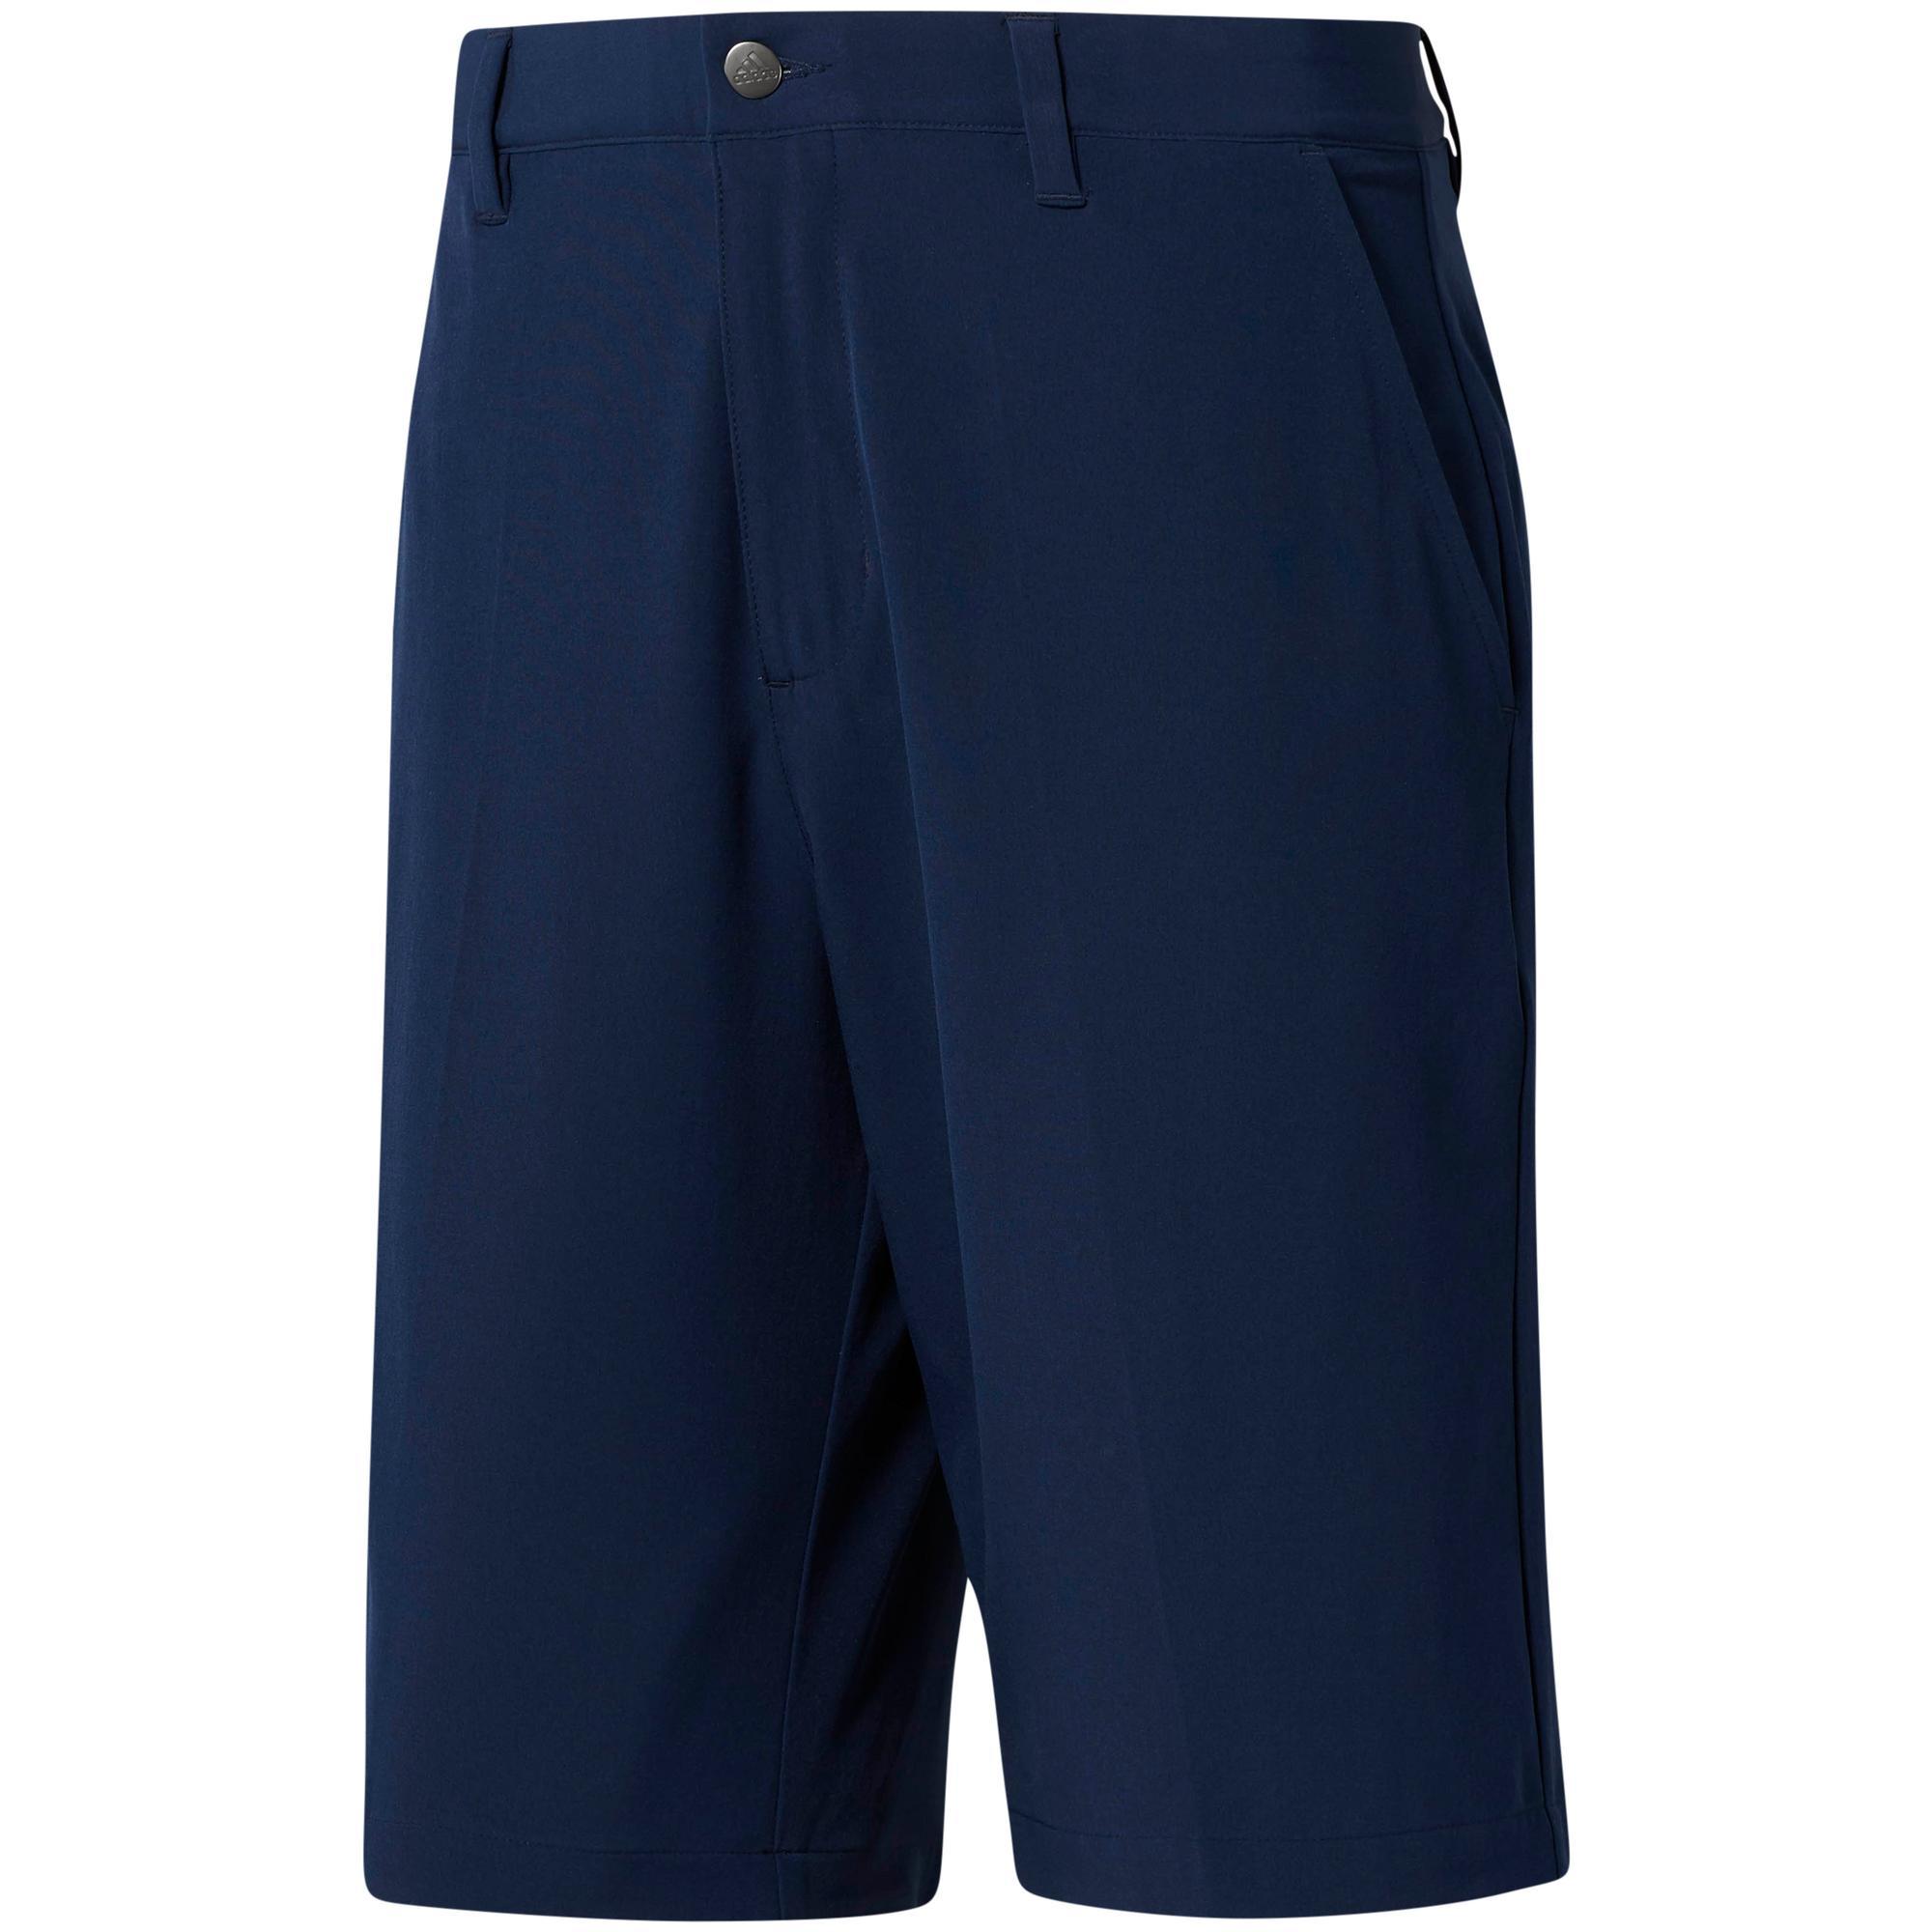 Men's Ultimate Shorts